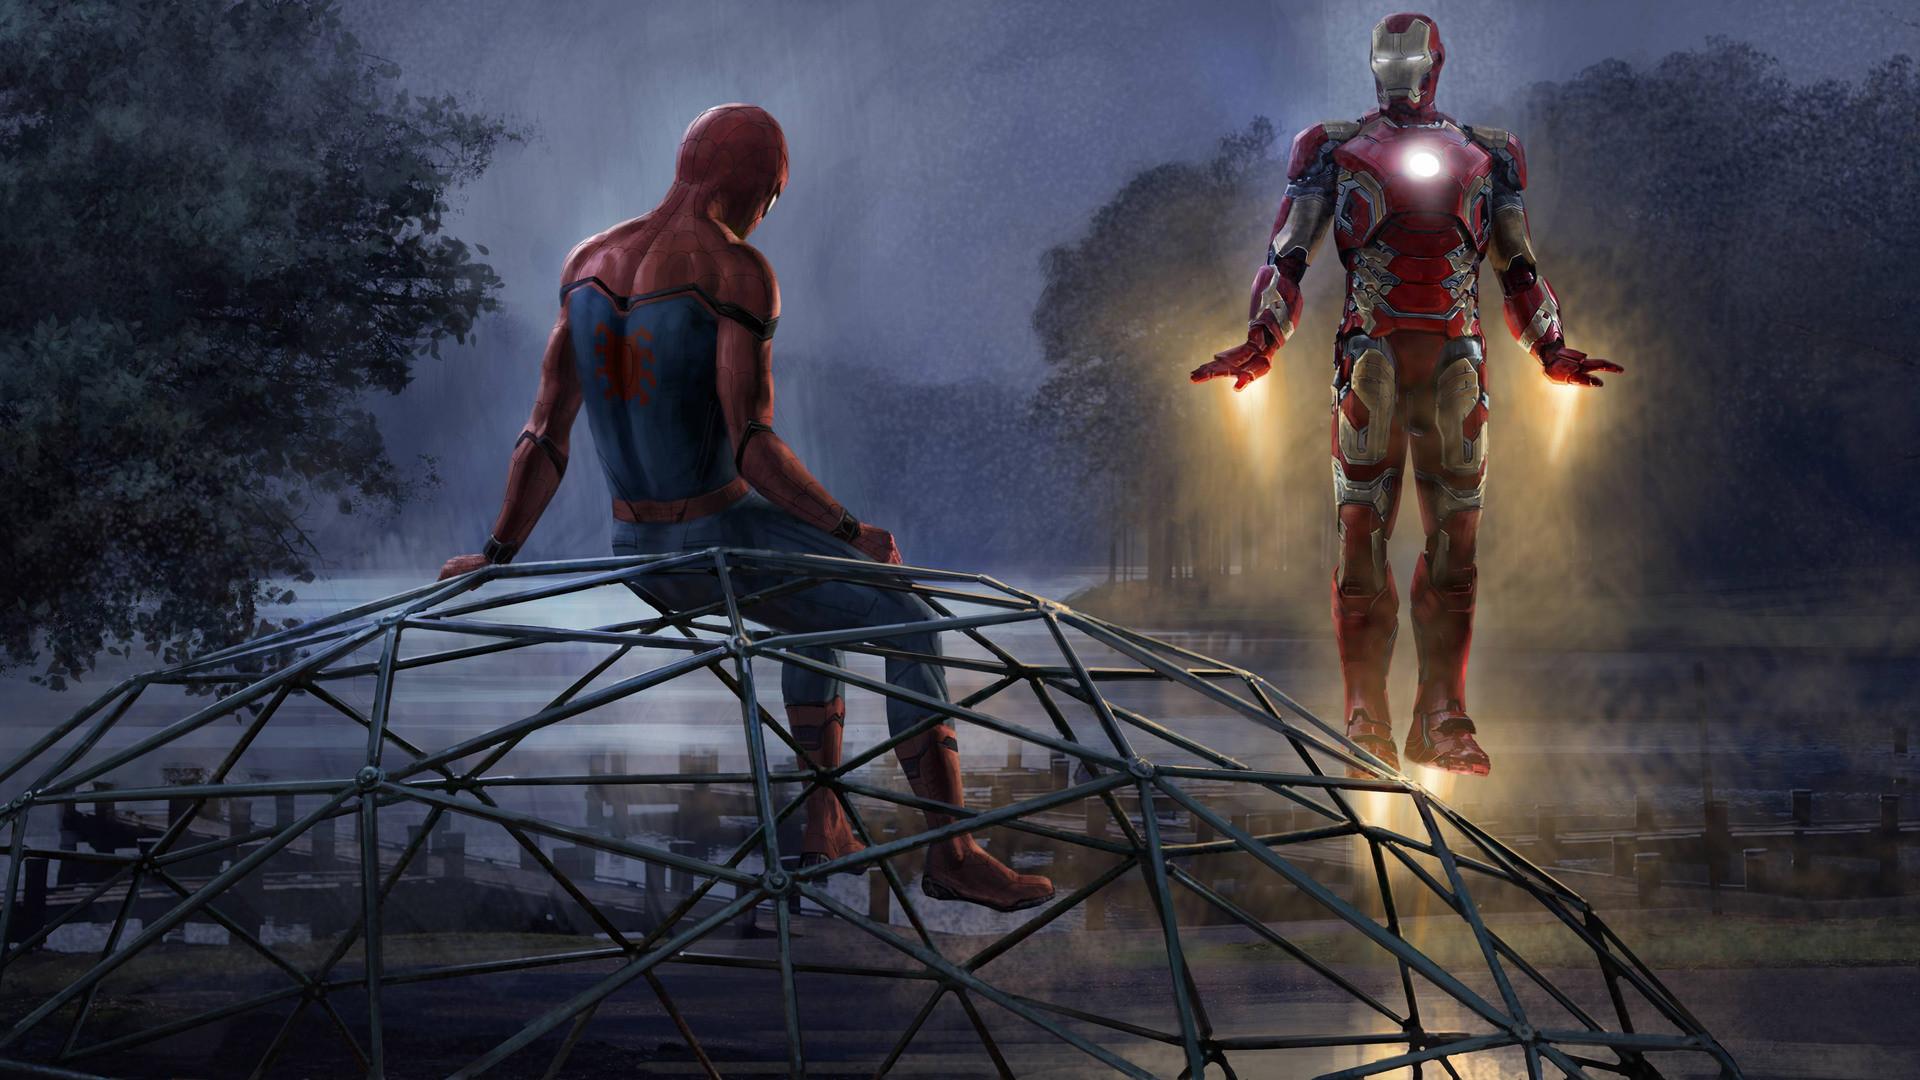 4k spiderman wallpaper 55 images - Iron man spiderman wallpaper ...